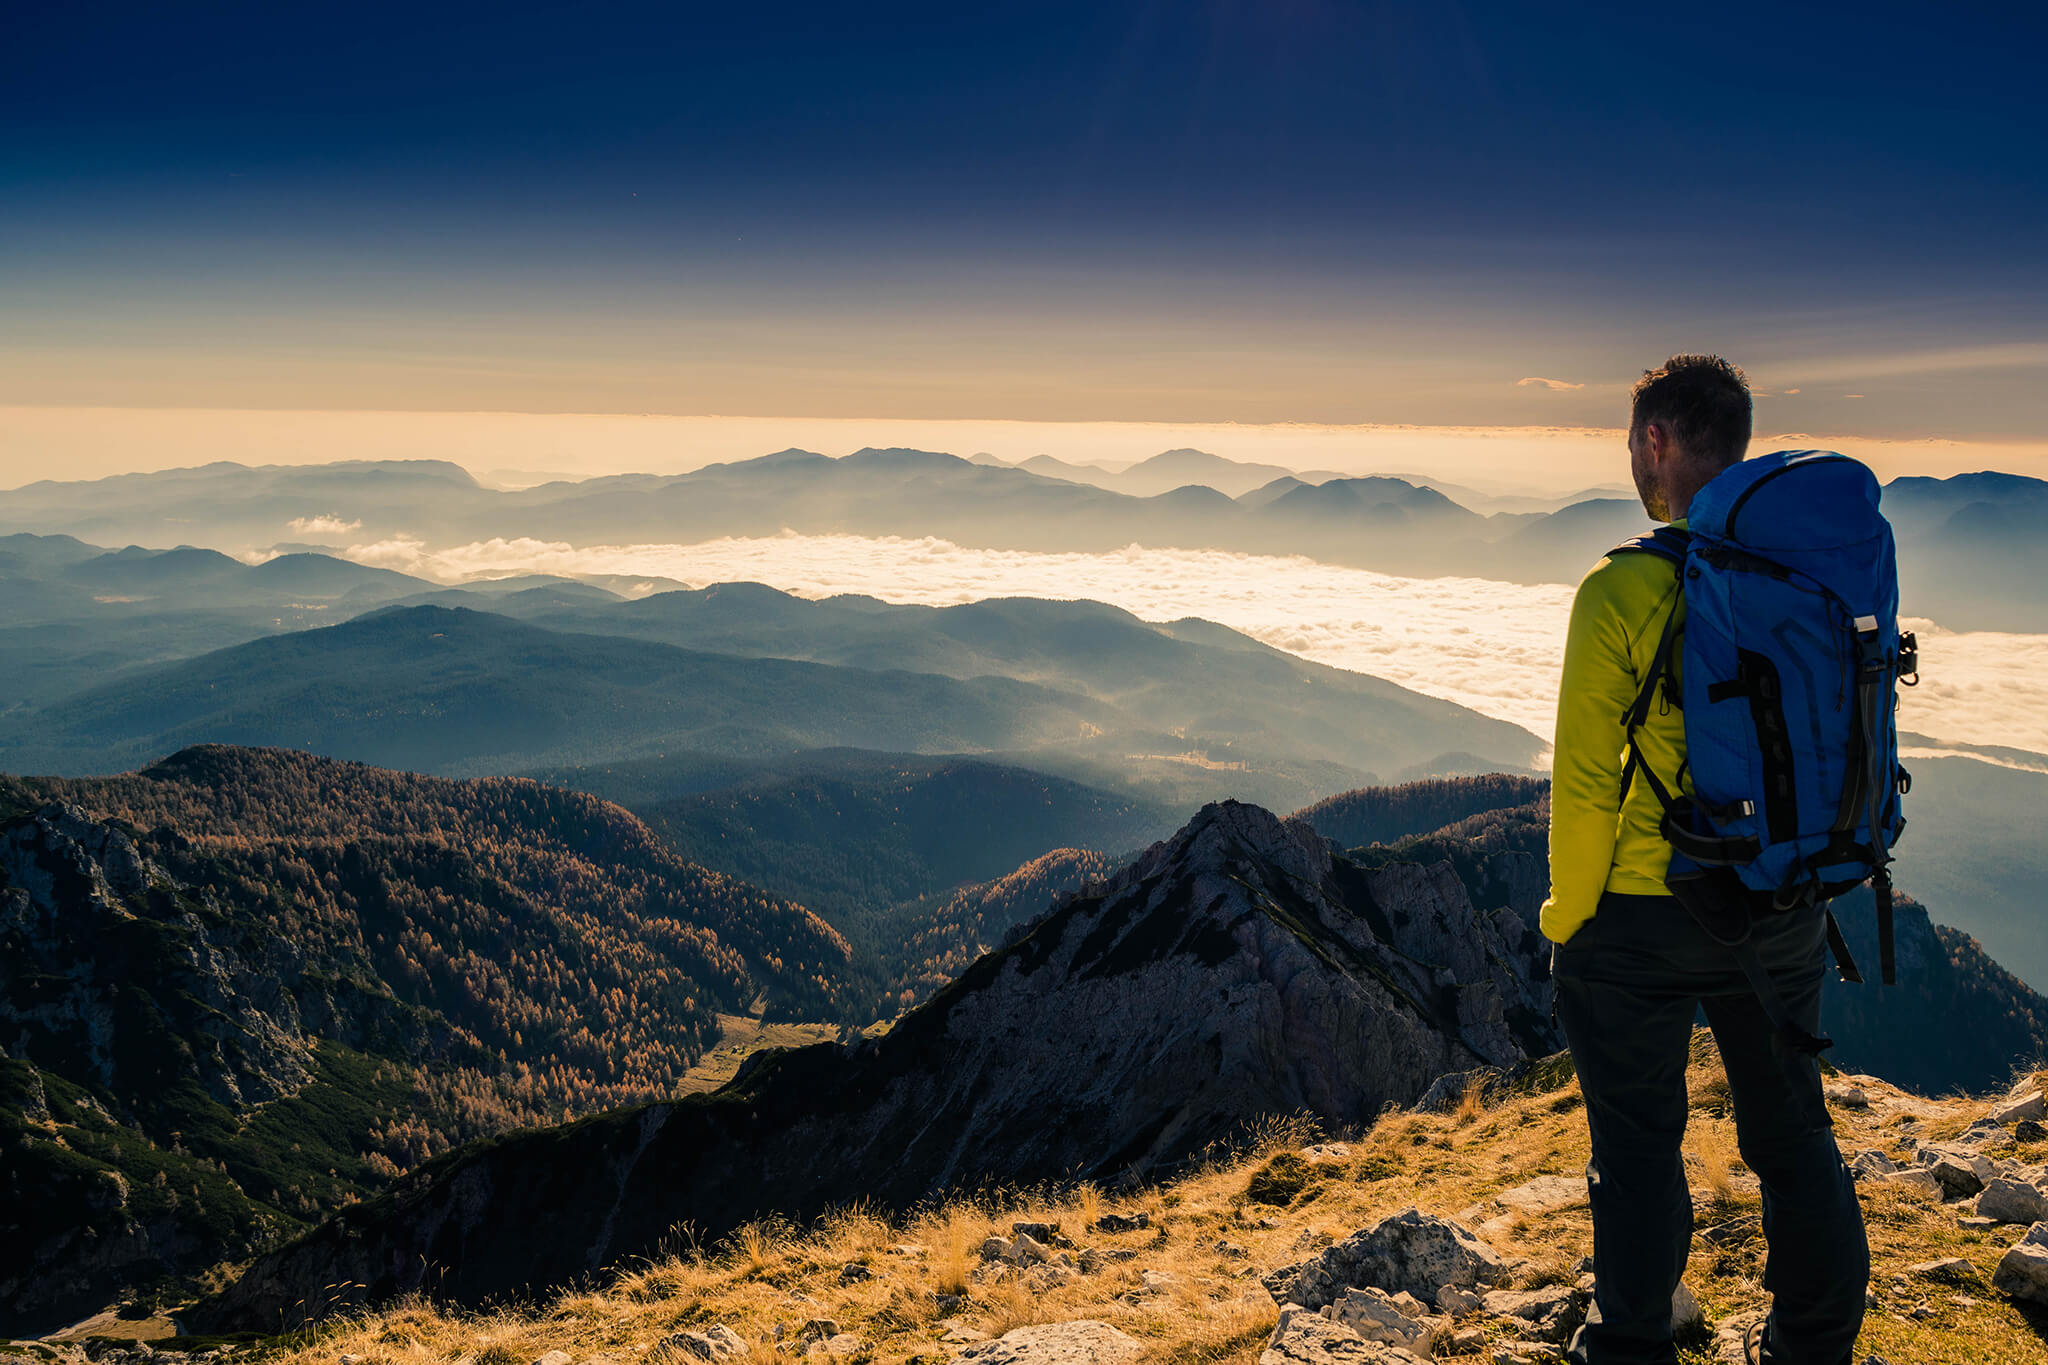 Protecht-mountain-climber-looking-out-horizon